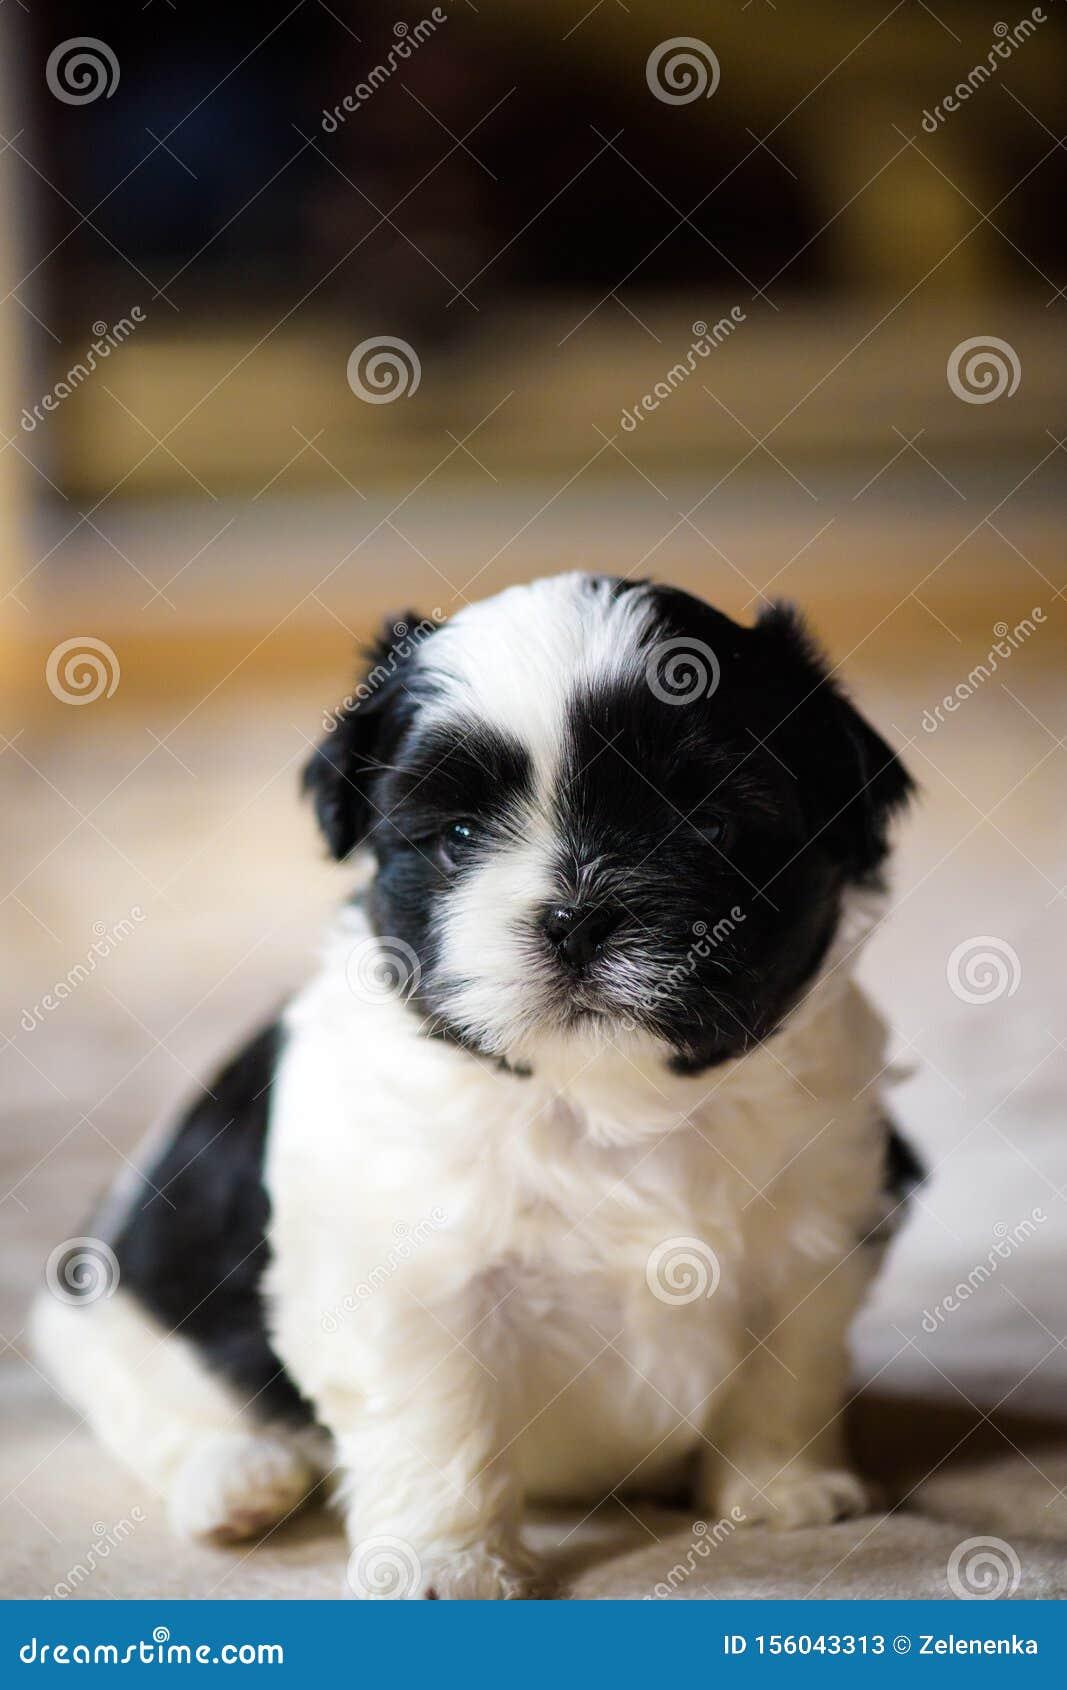 Shih Tzu Puppies Stock Image Image Of Outside Animal 156043313